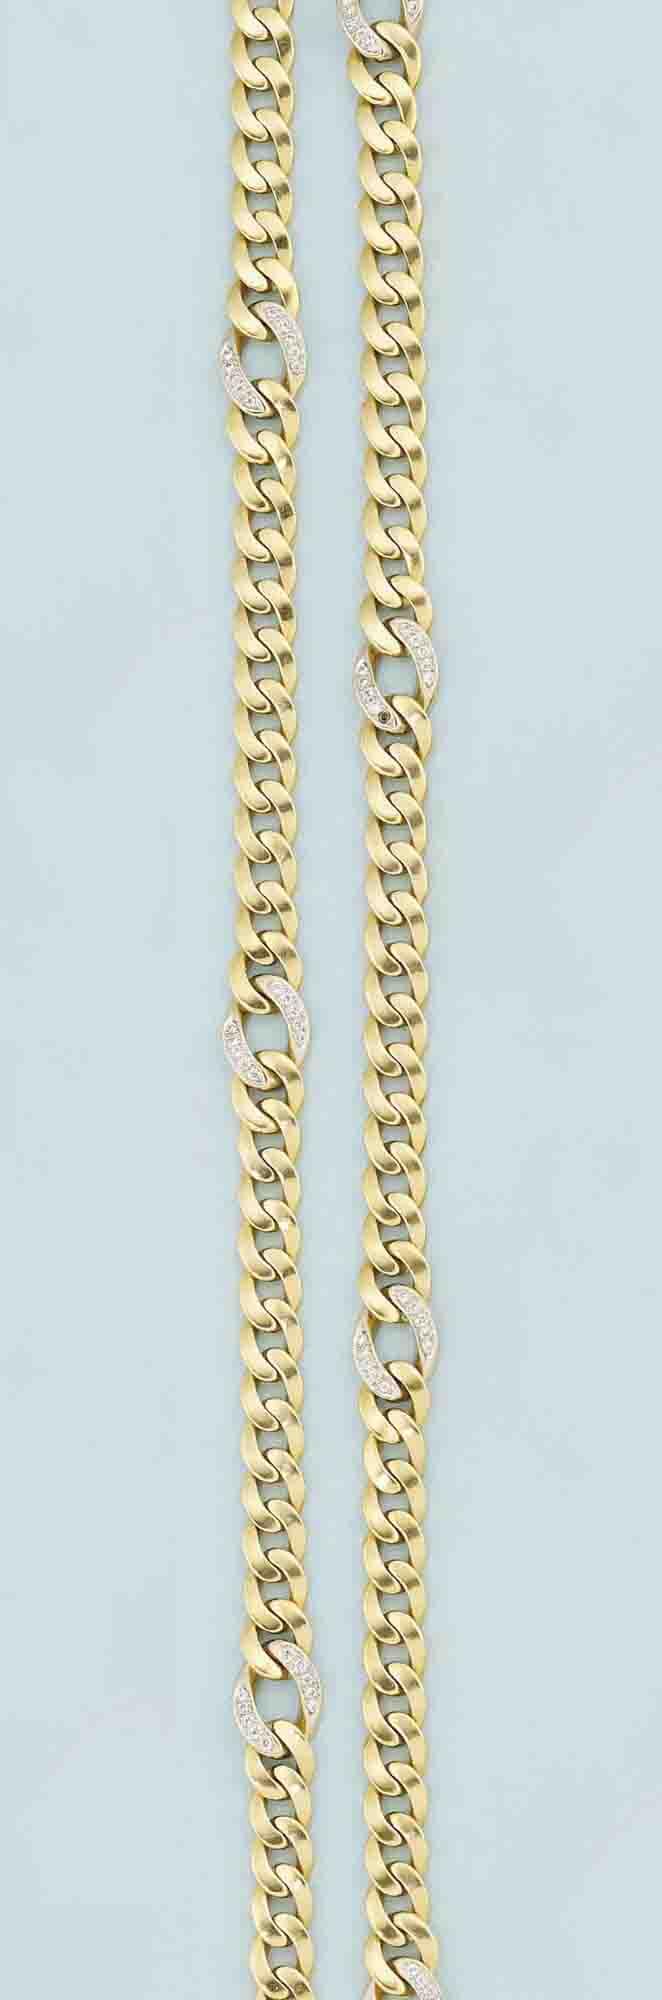 Two diamond-set necklaces